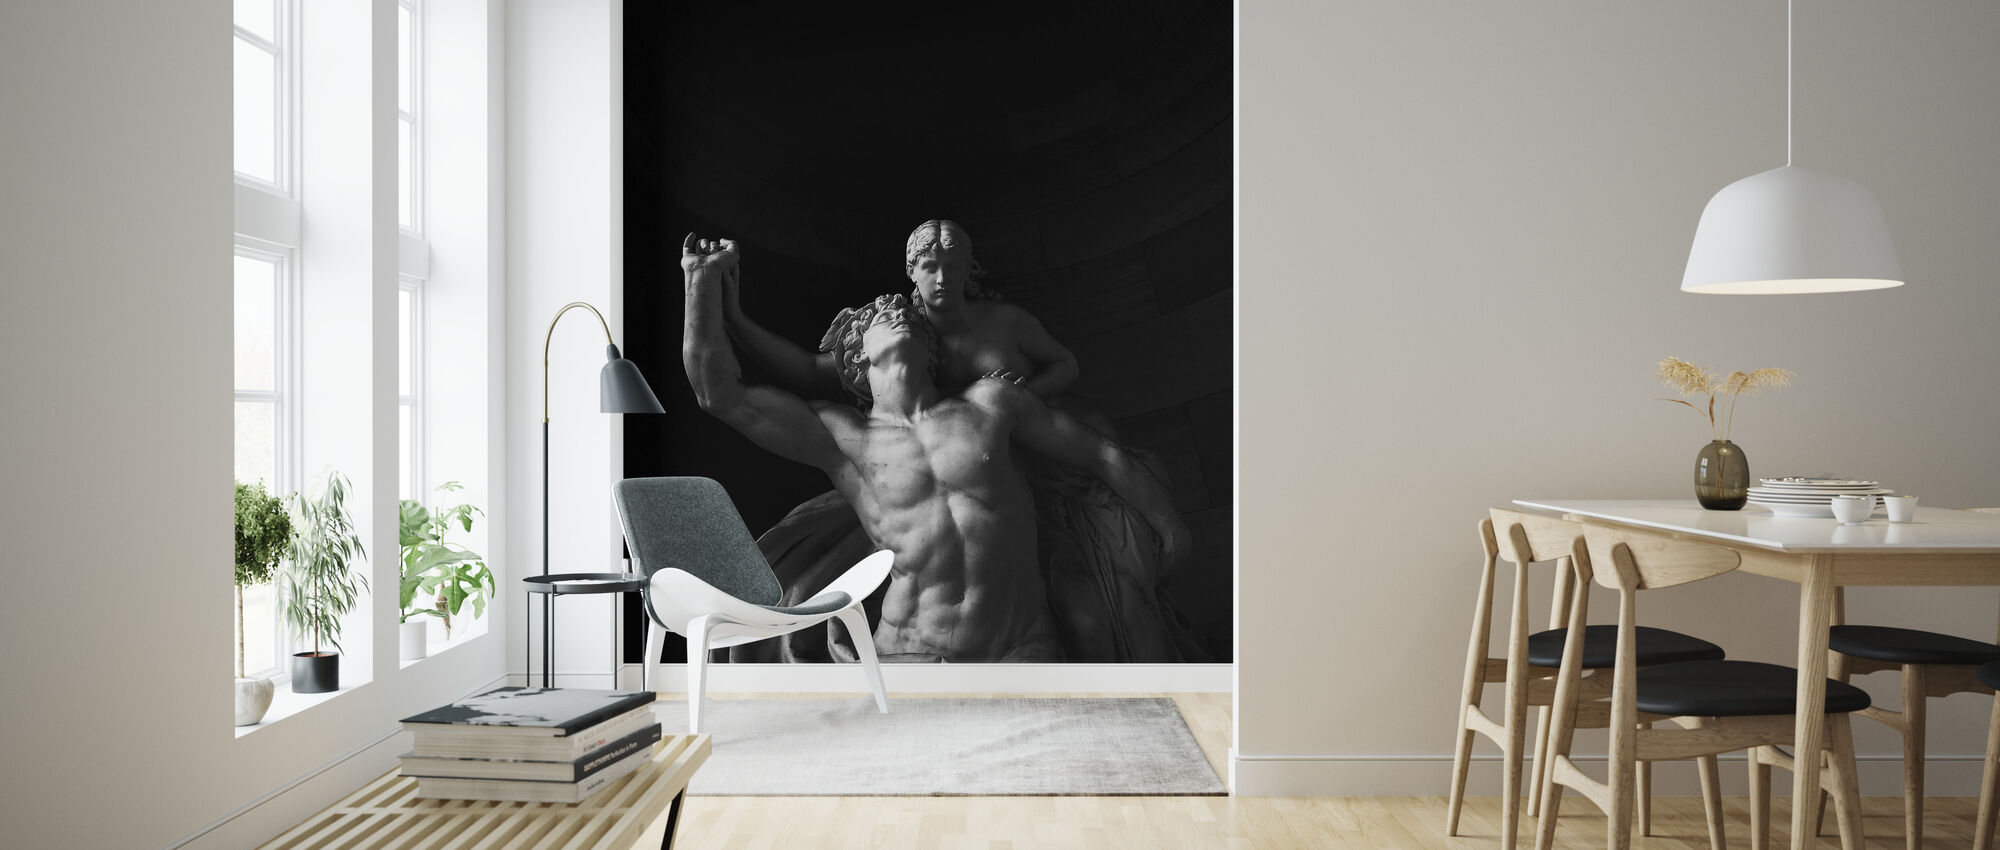 Statue - Wallpaper - Living Room